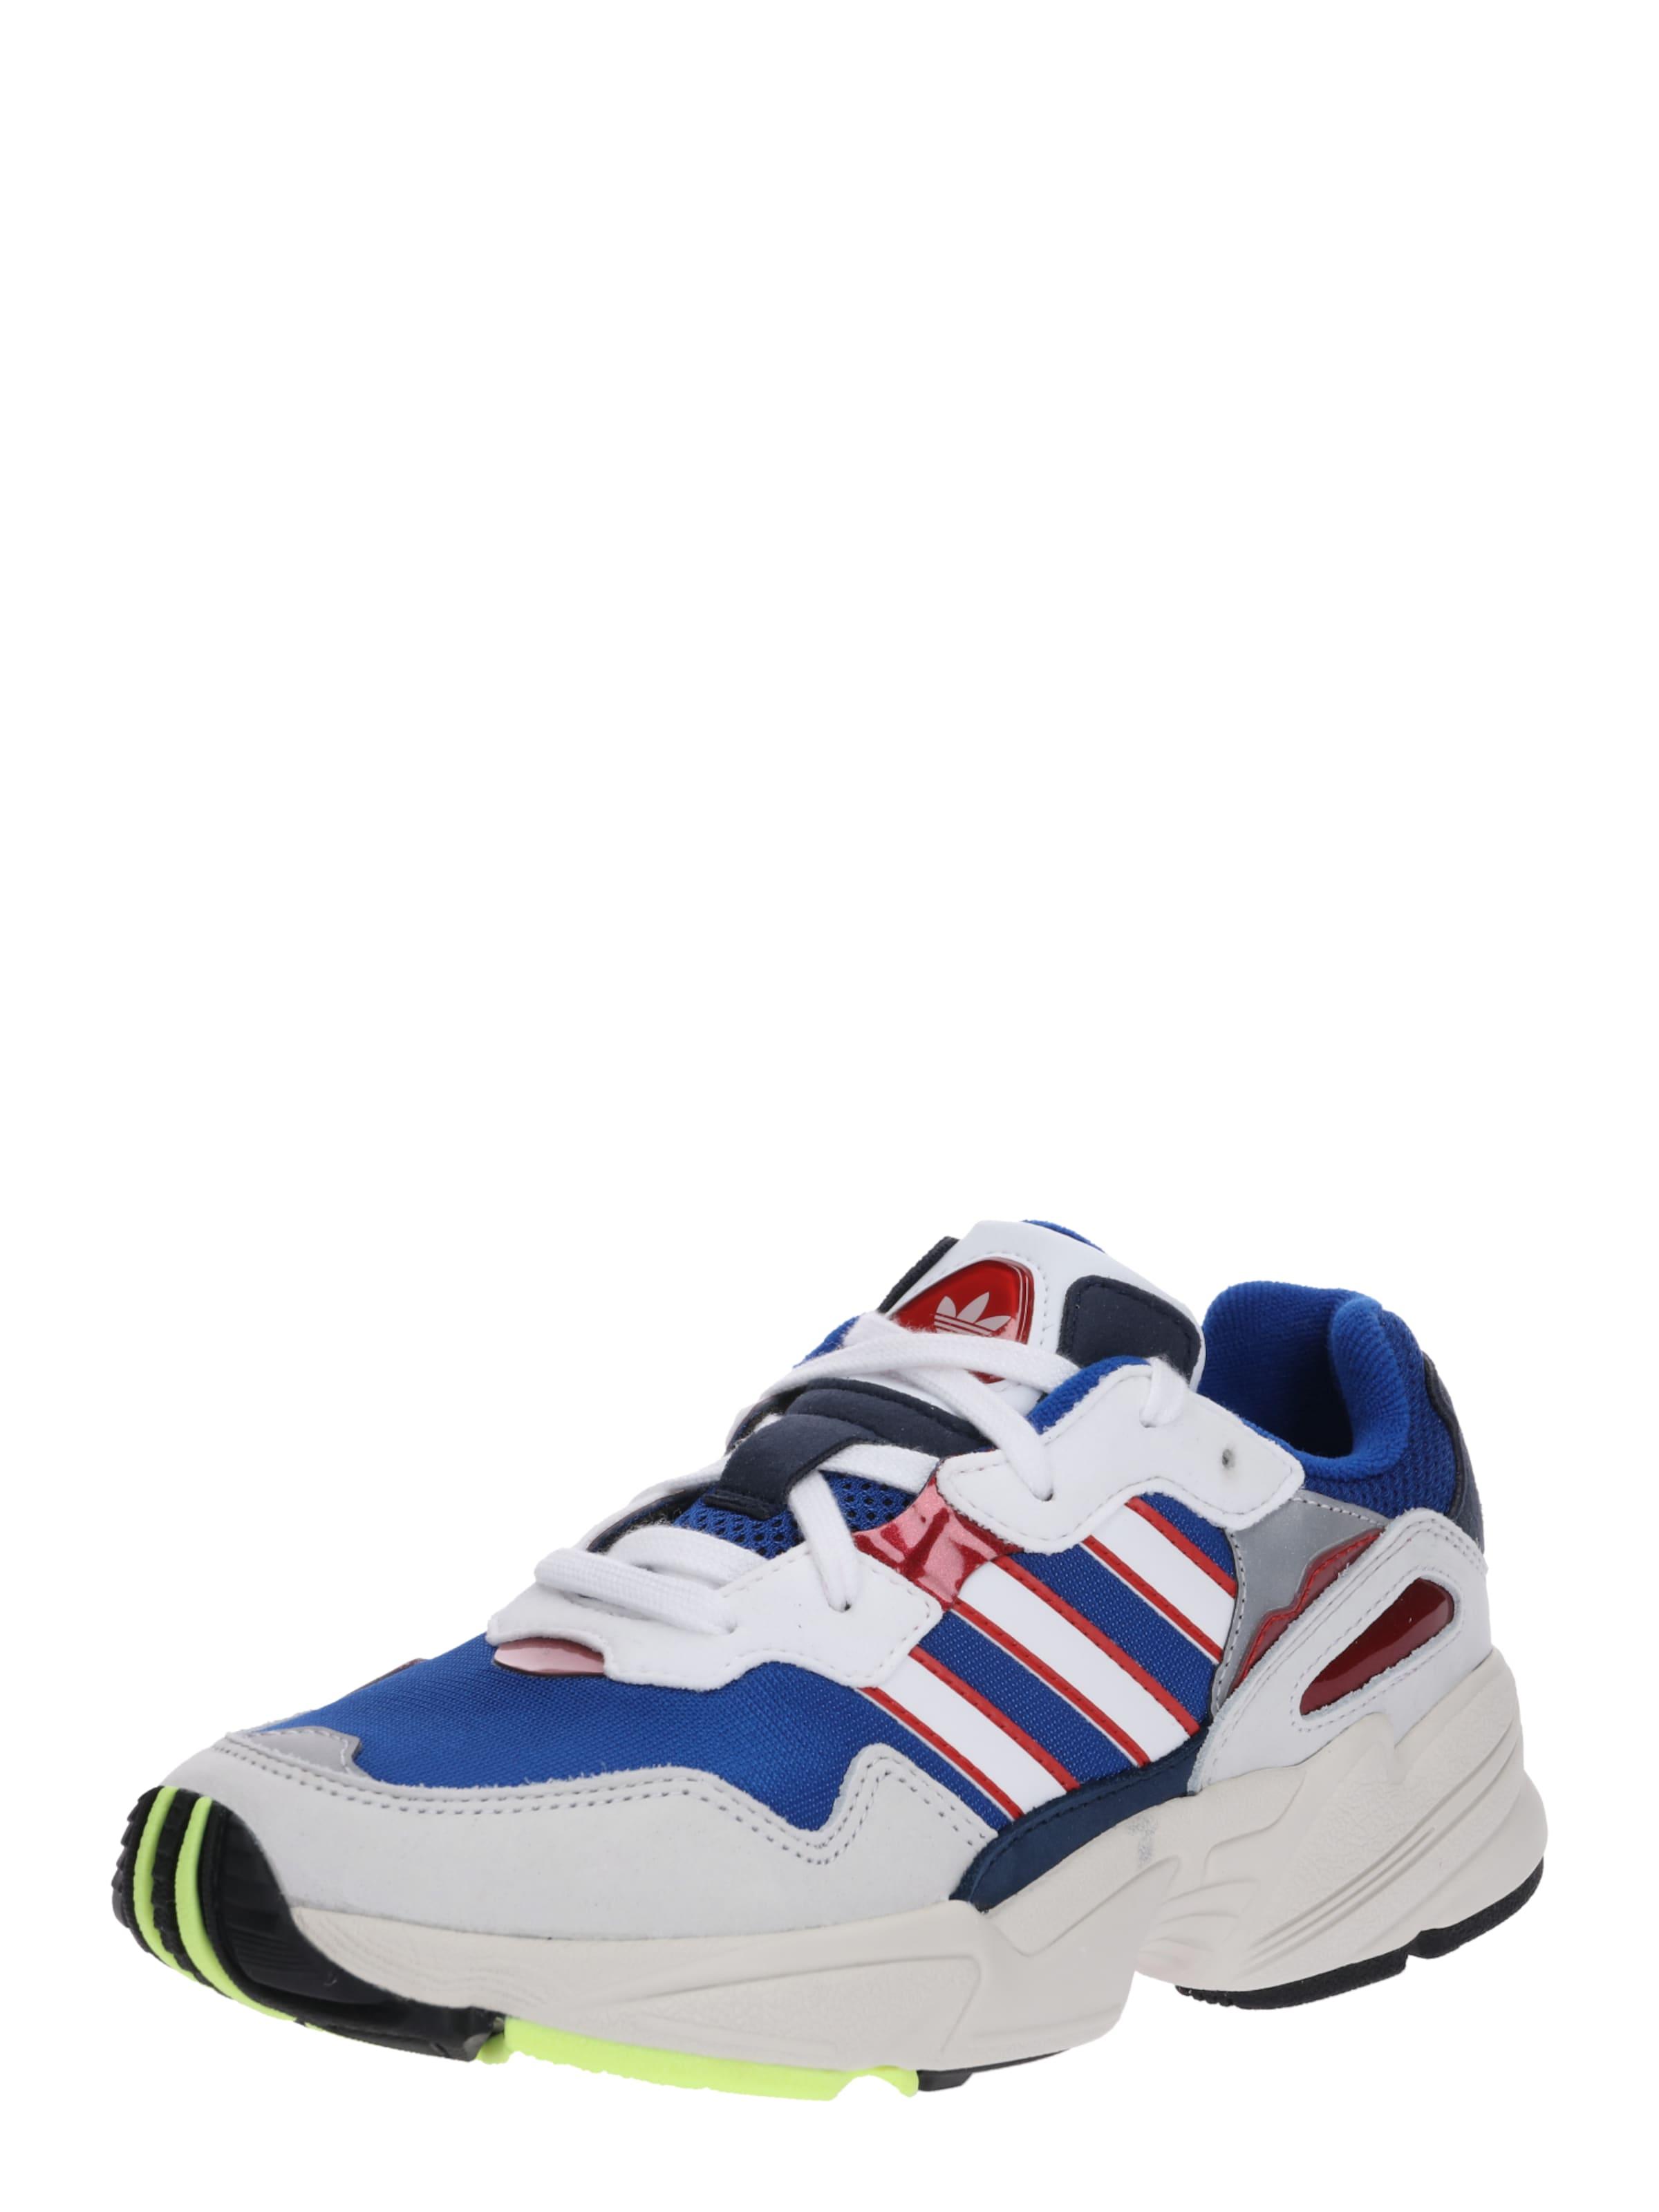 Sneaker LilaMischfarben Offwhite In Adidas Originals 'yung' 76fbgy